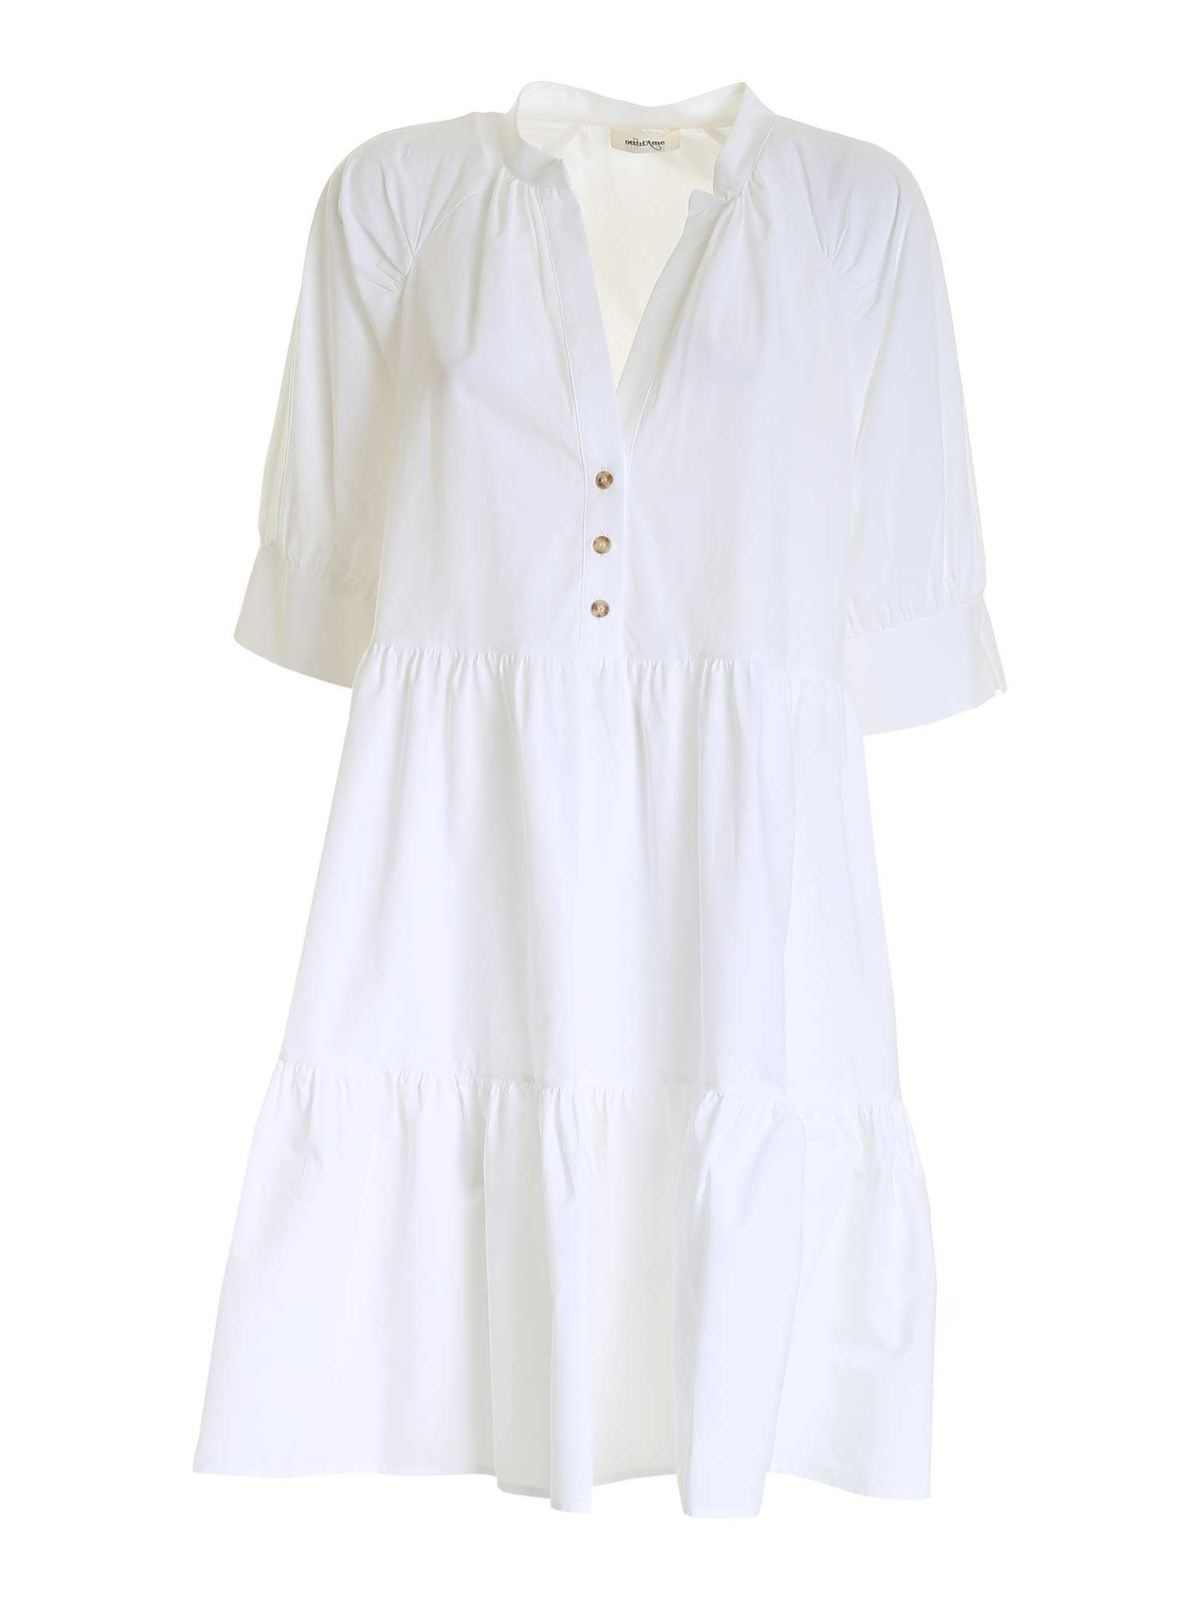 Ottod'ame RAGLAN SLEEVES DRESS IN WHITE